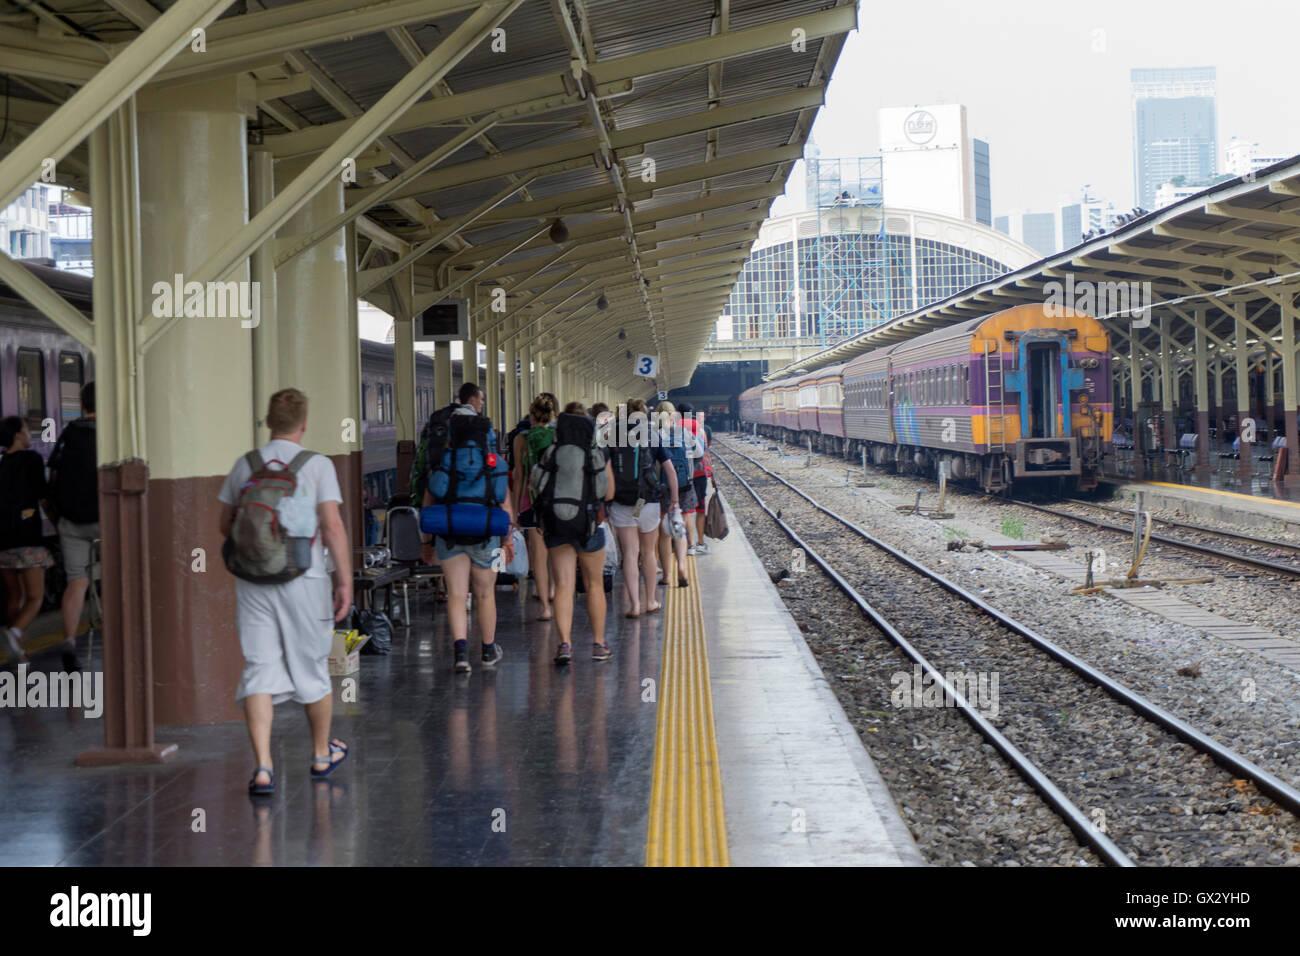 Backpackers arriving in Hua Lamphong railway station in Bangkok - Stock Image